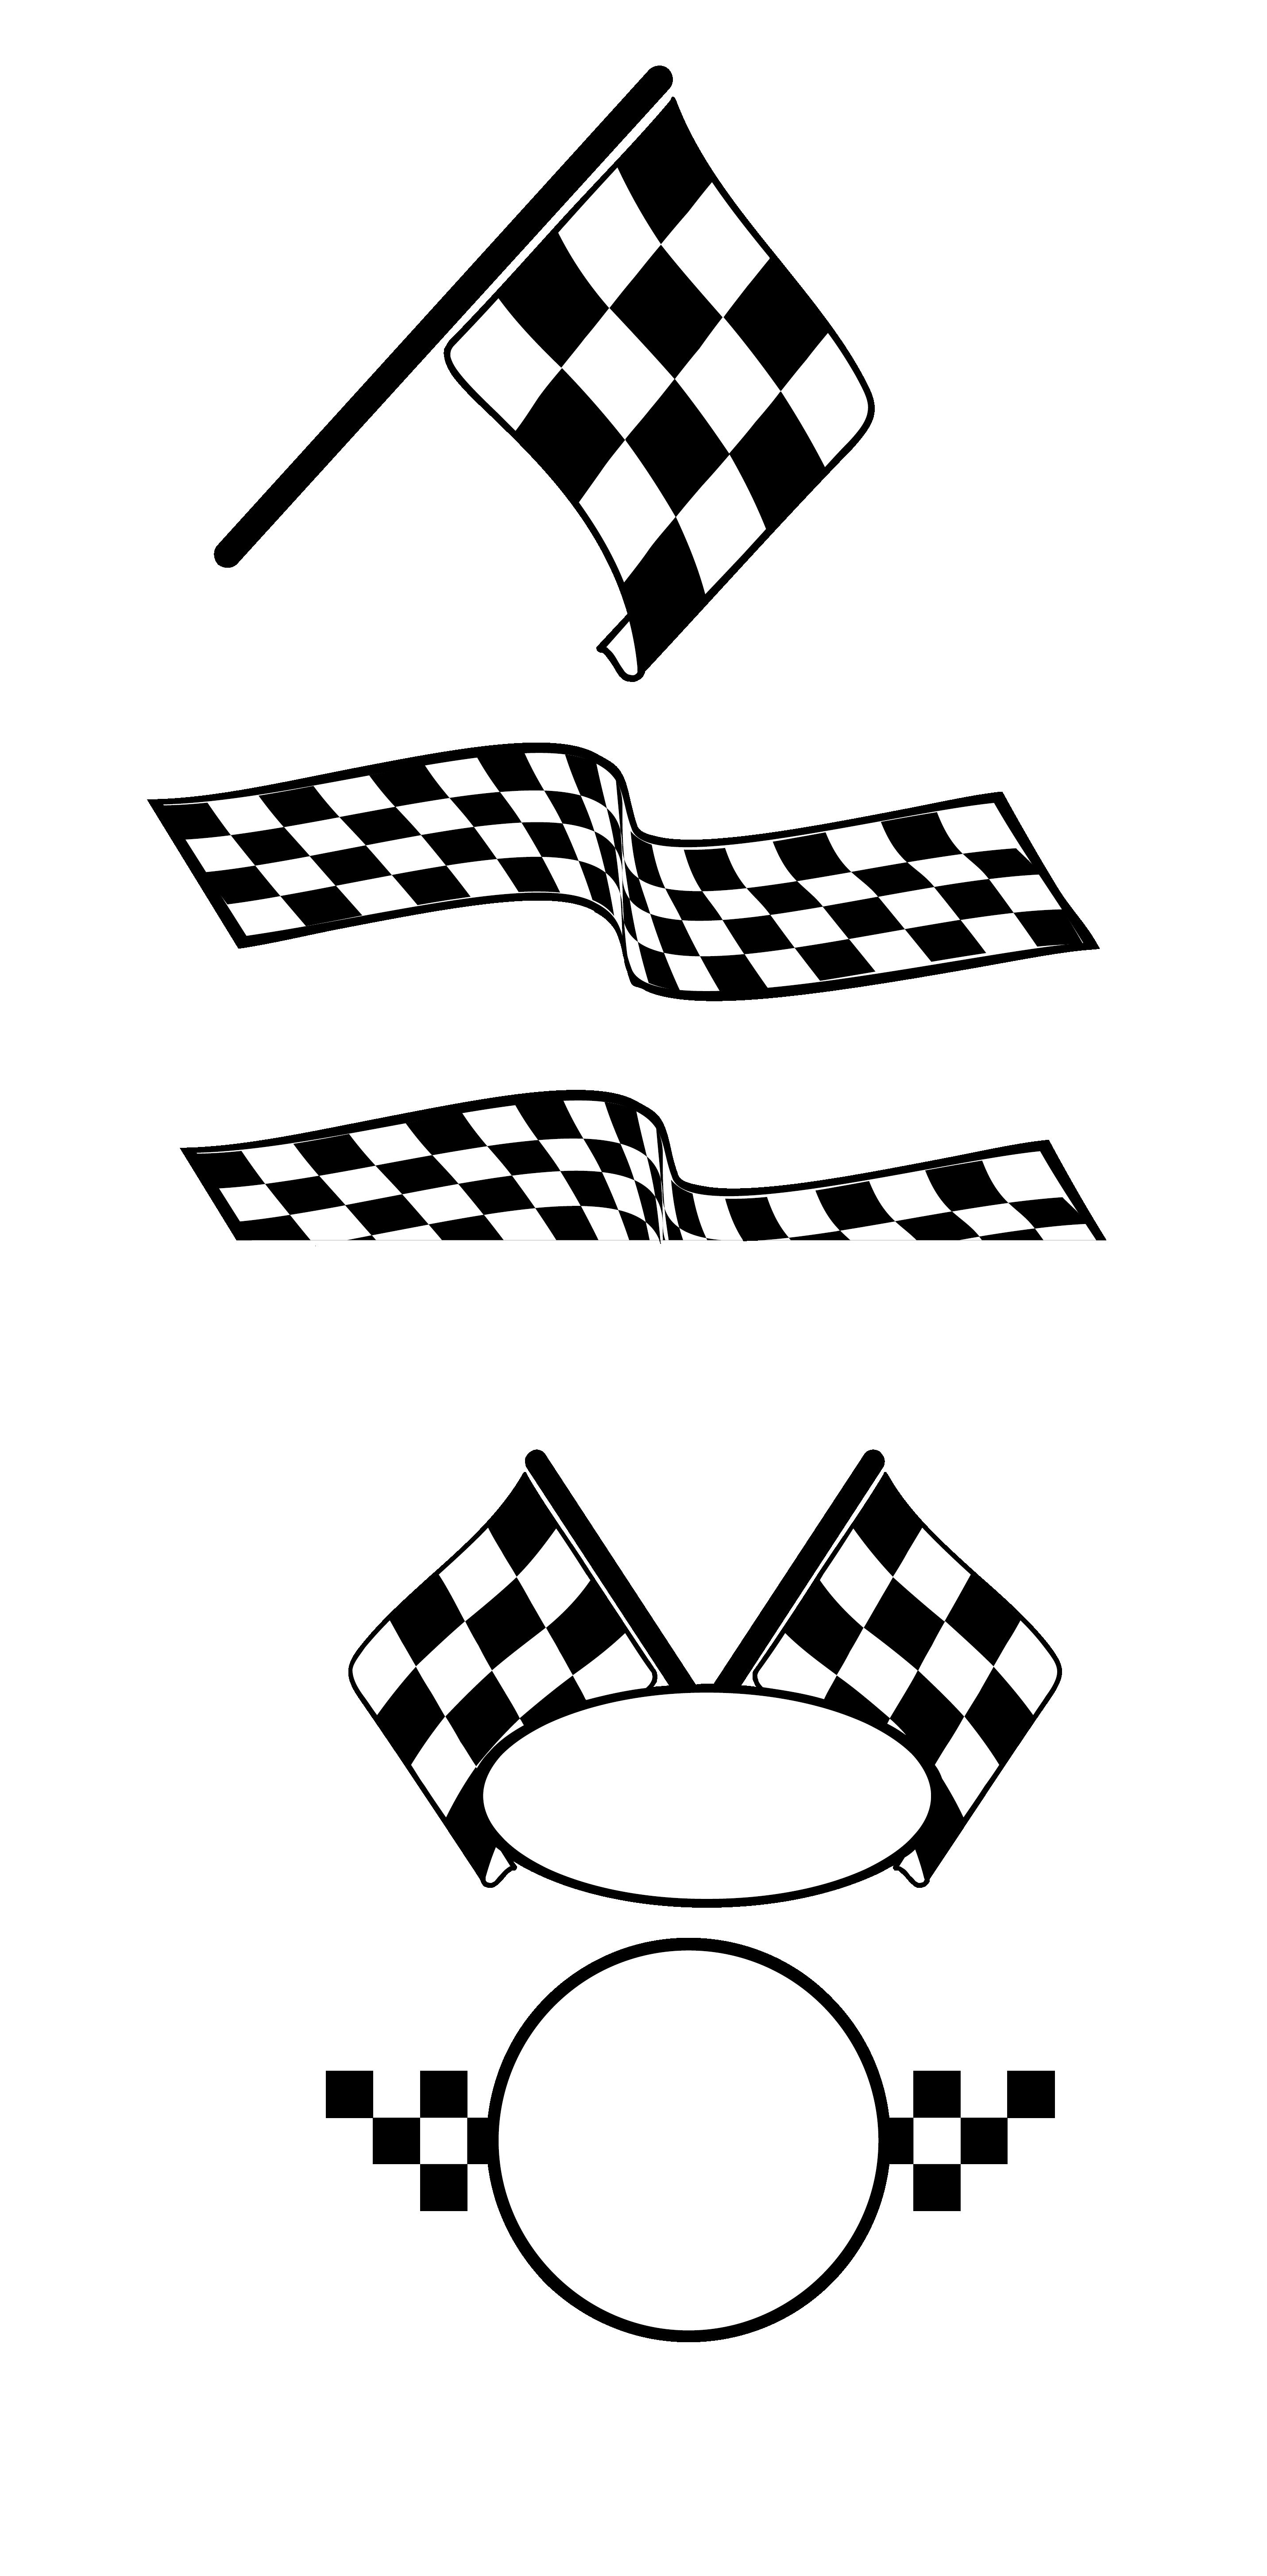 Car race flags clipart jpg stock Auto racing Racing flags - Vector,Cartoon,pattern,Racing car,banner ... jpg stock